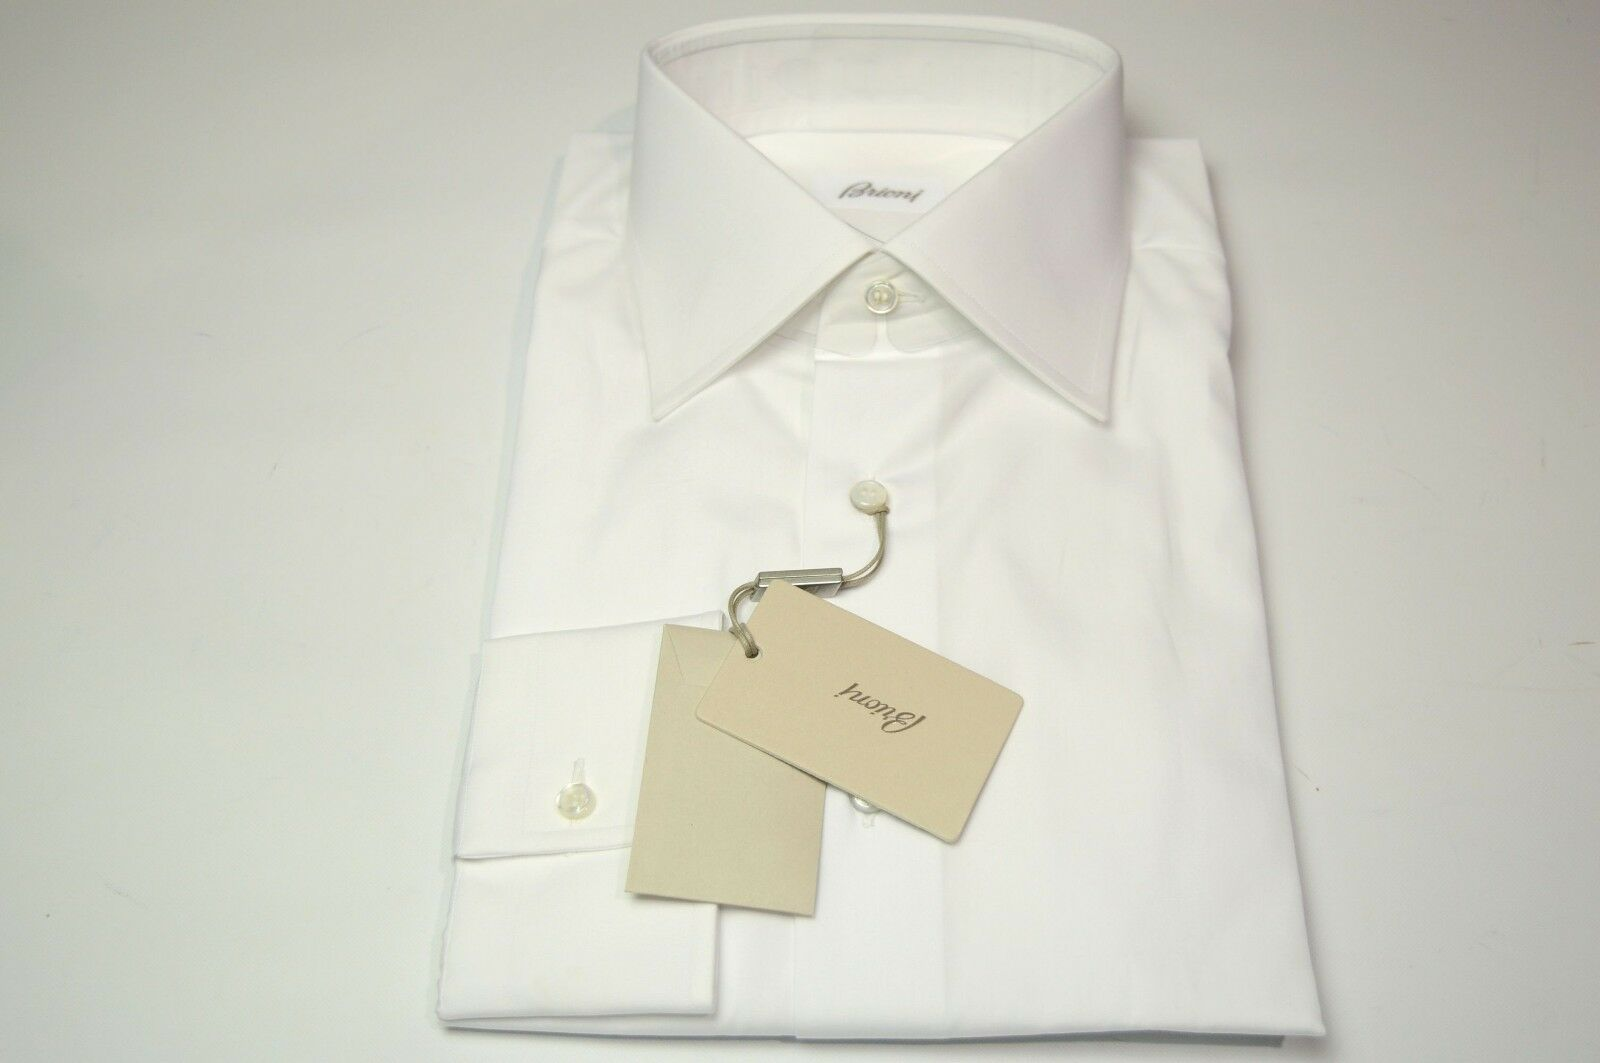 NEW  BRIONI Dress  hemd 100% baumwolle Größe 16 Us 41 Eu  (ARA51)